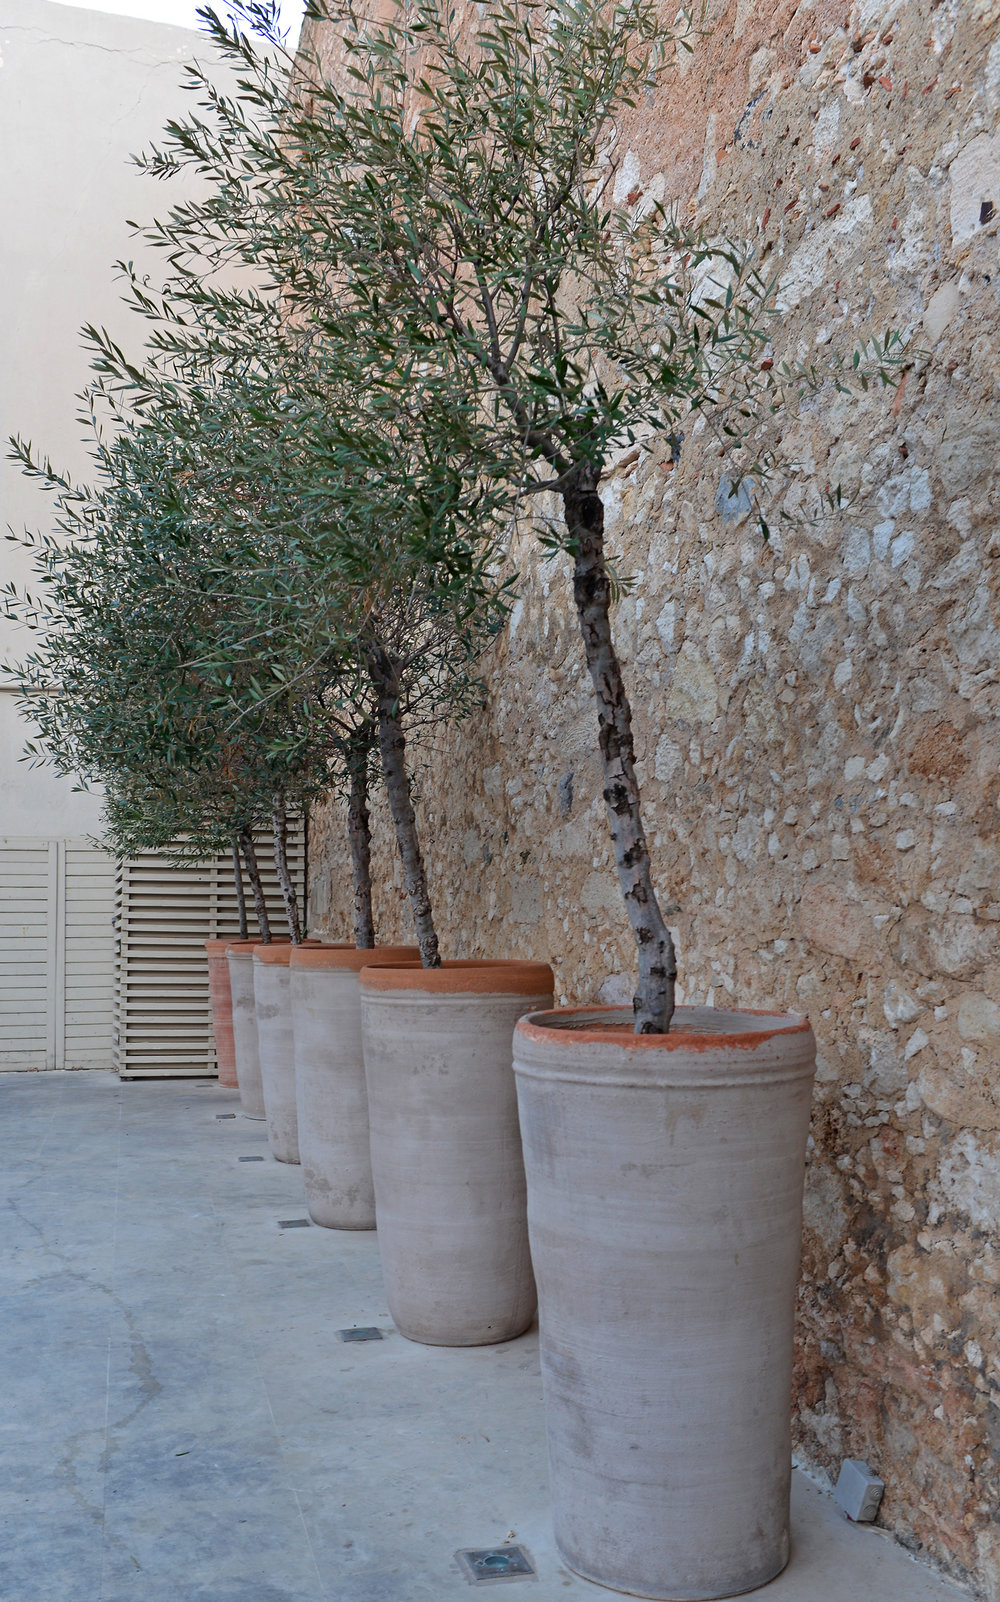 a kreta potteplanter (12).jpg